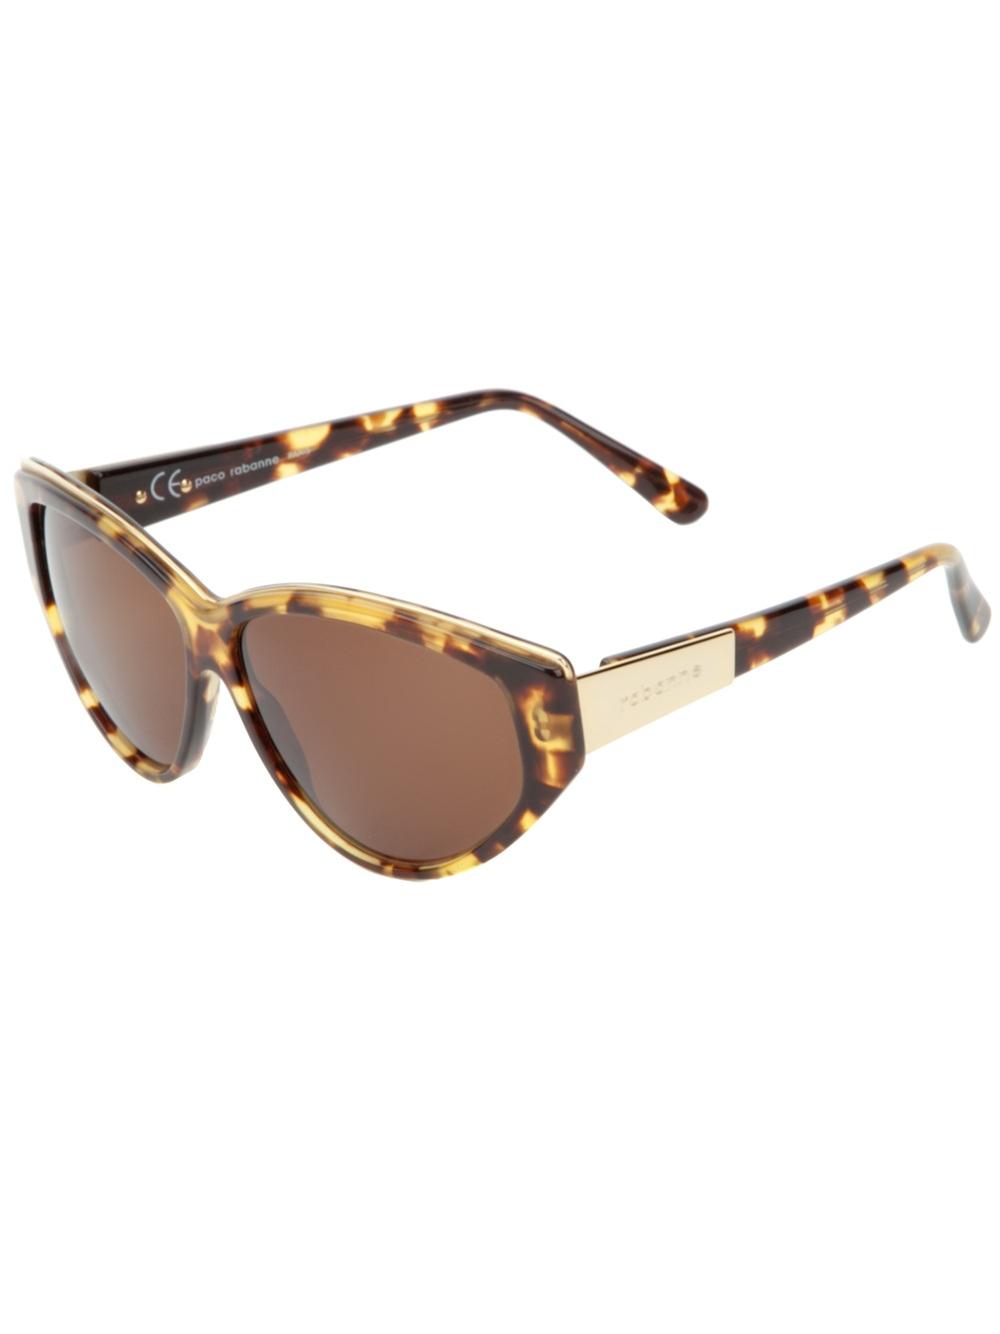 efddf68047a Lyst - Paco Rabanne Cat-Eye Frame Sunglasses in Brown